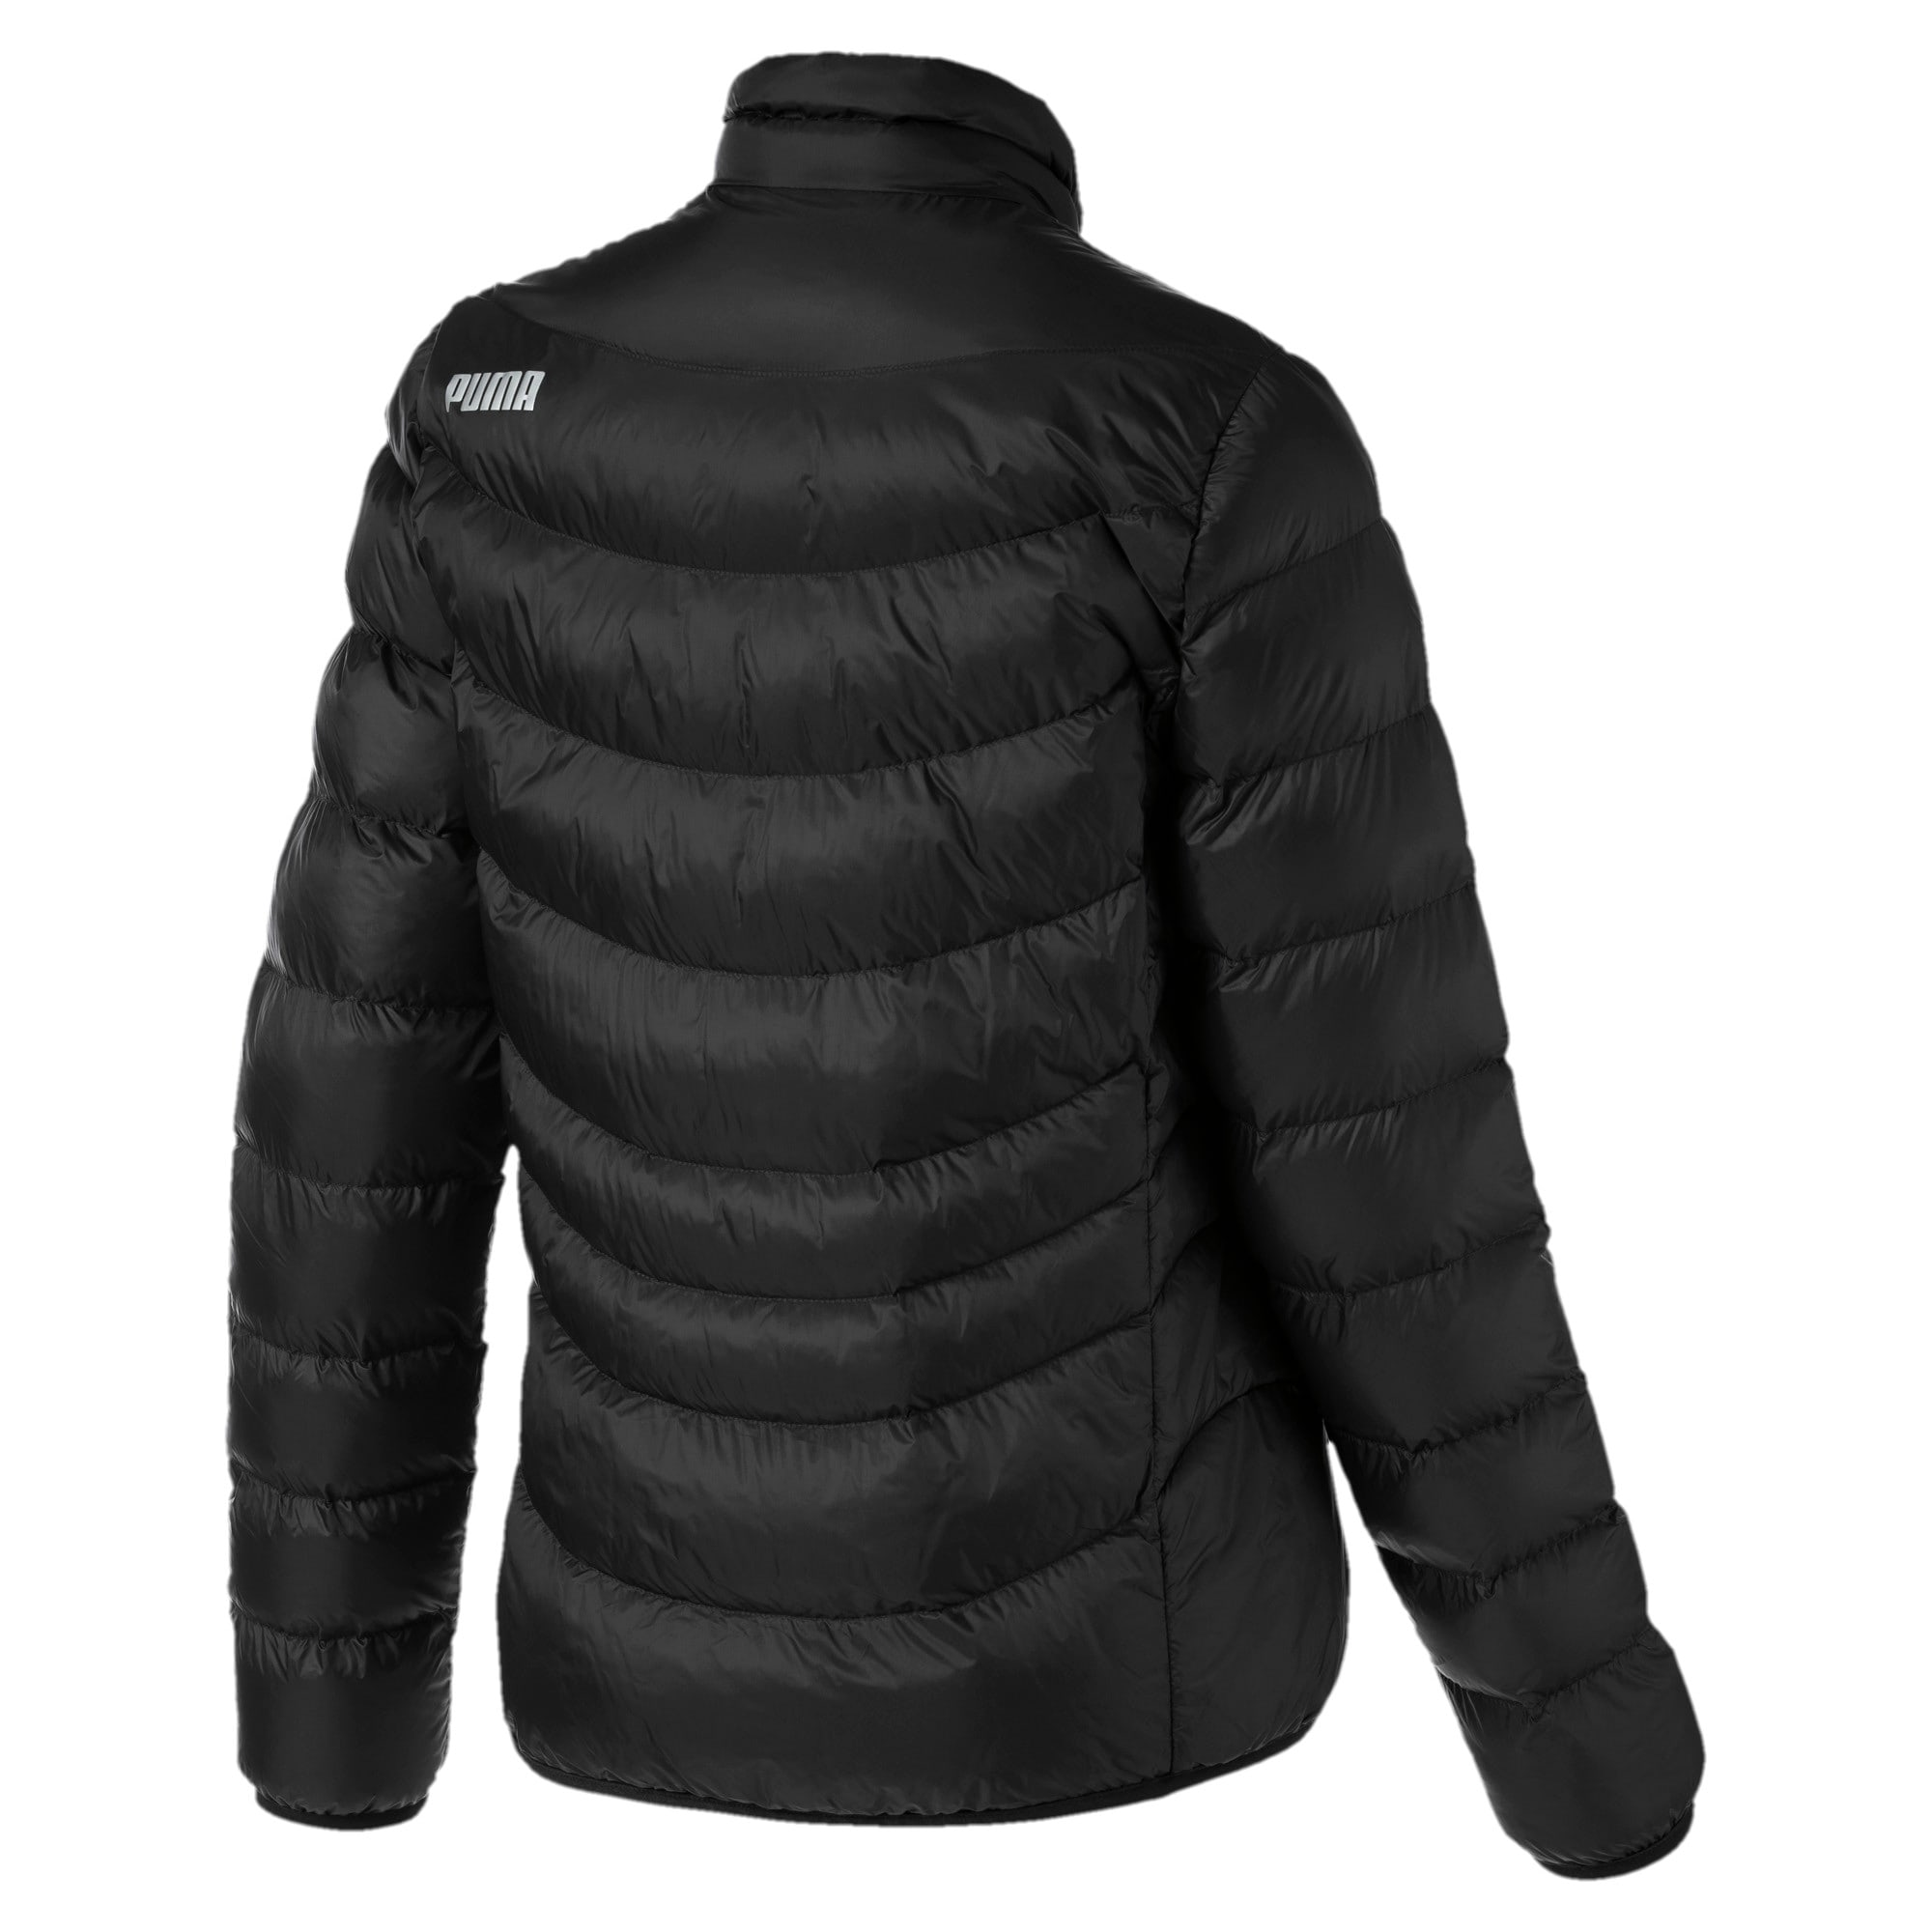 Thumbnail 5 of Ultralight warmCELL Women's Jacket, Puma Black, medium